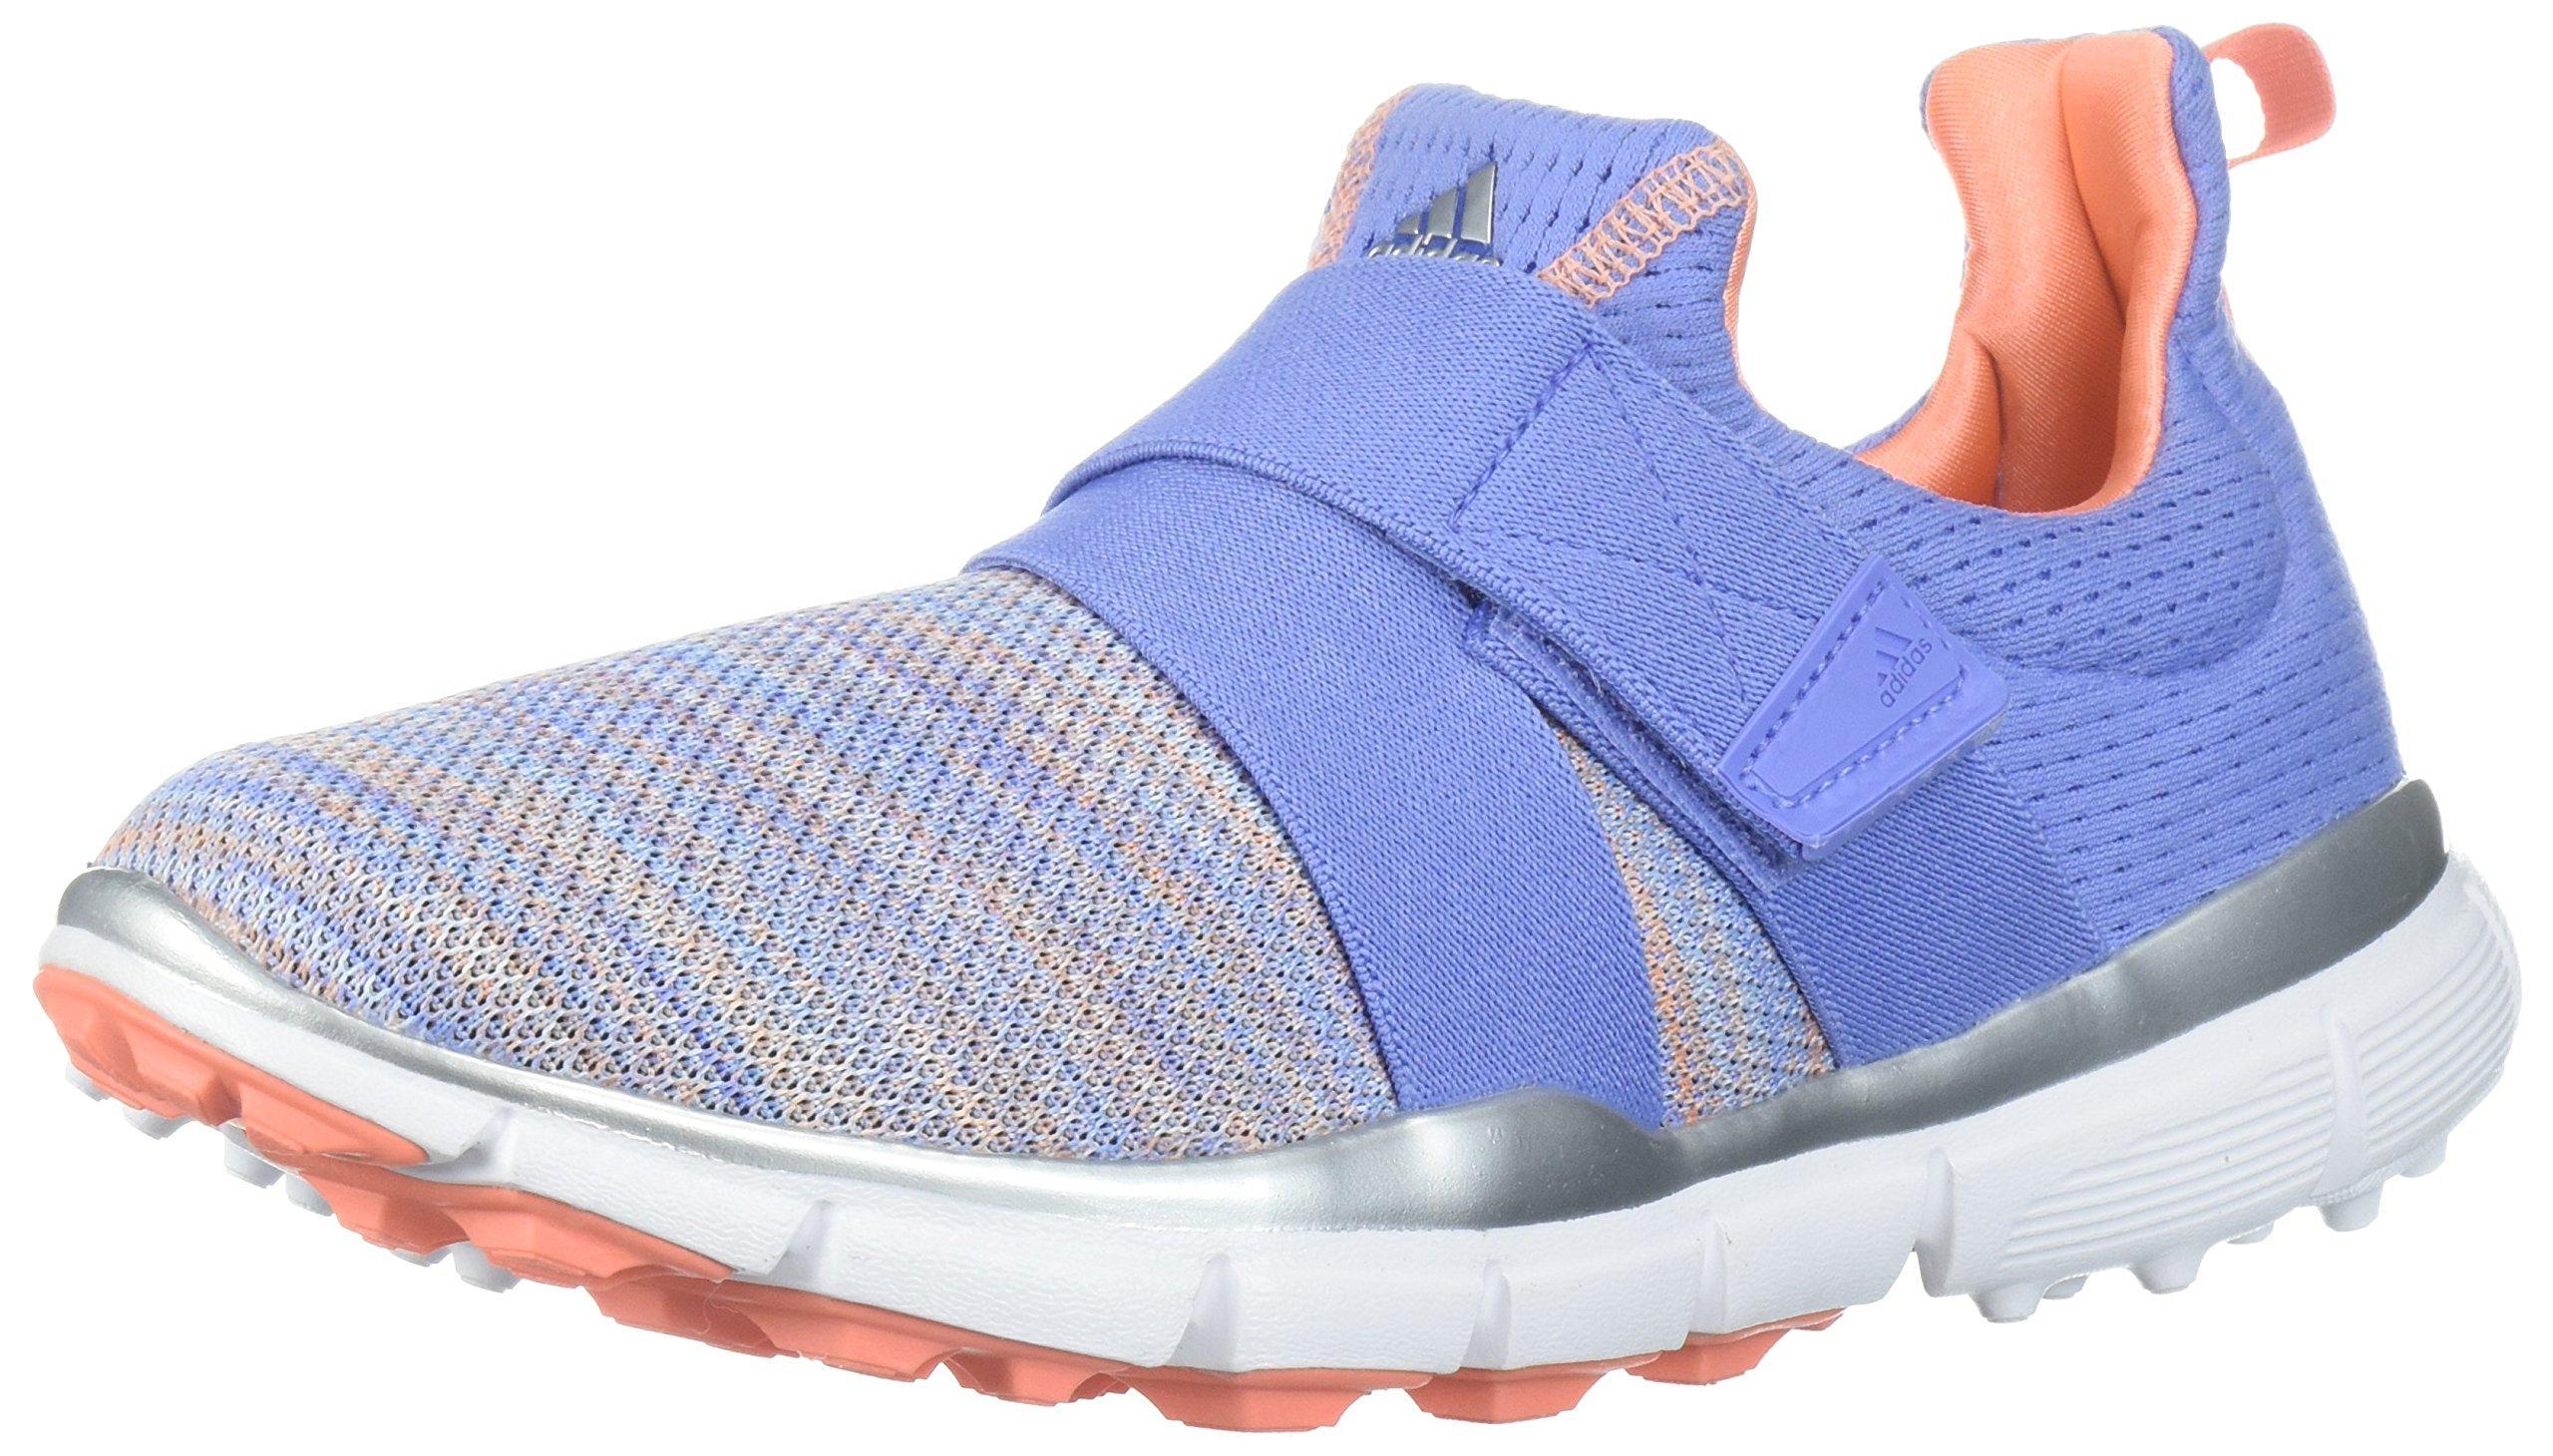 W Climacool Knit Golf Shoes, , , W Climacool Knit